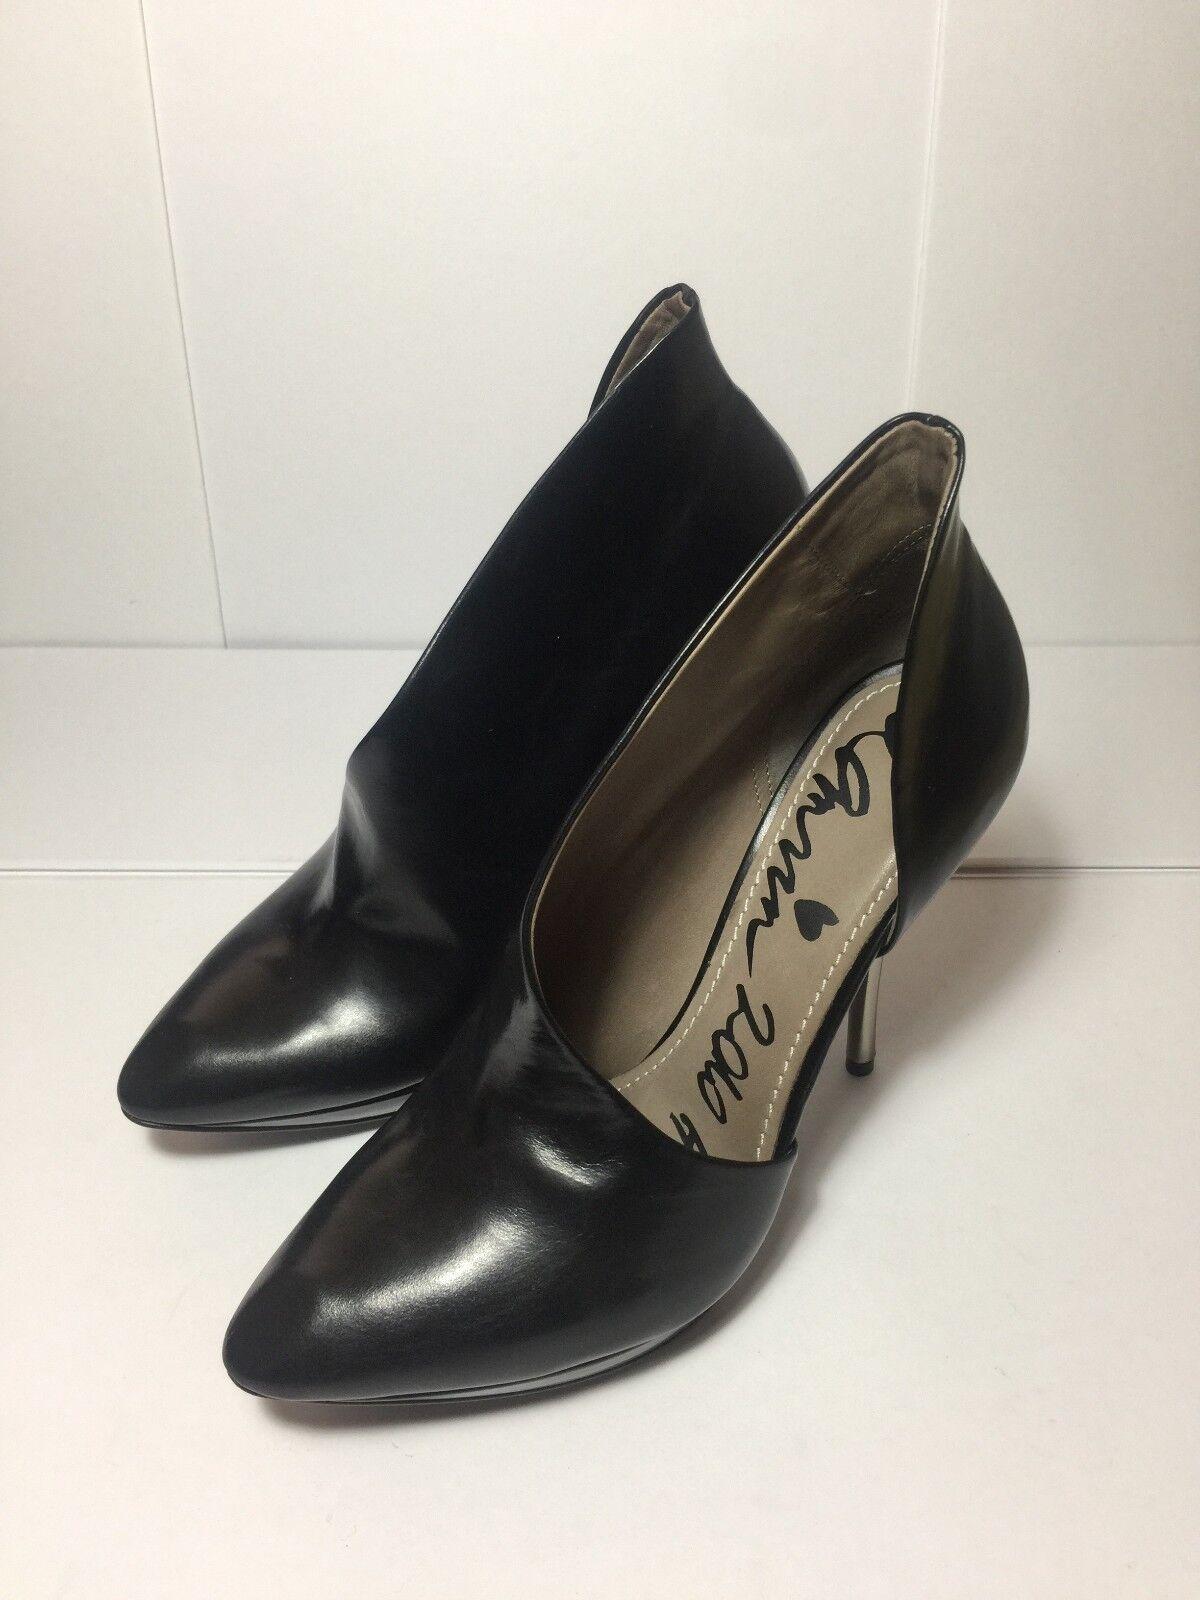 =STYLISH= LANVIN Runway 2010 Black Asymmetric Leather Ankle Metal Heels EU37.5